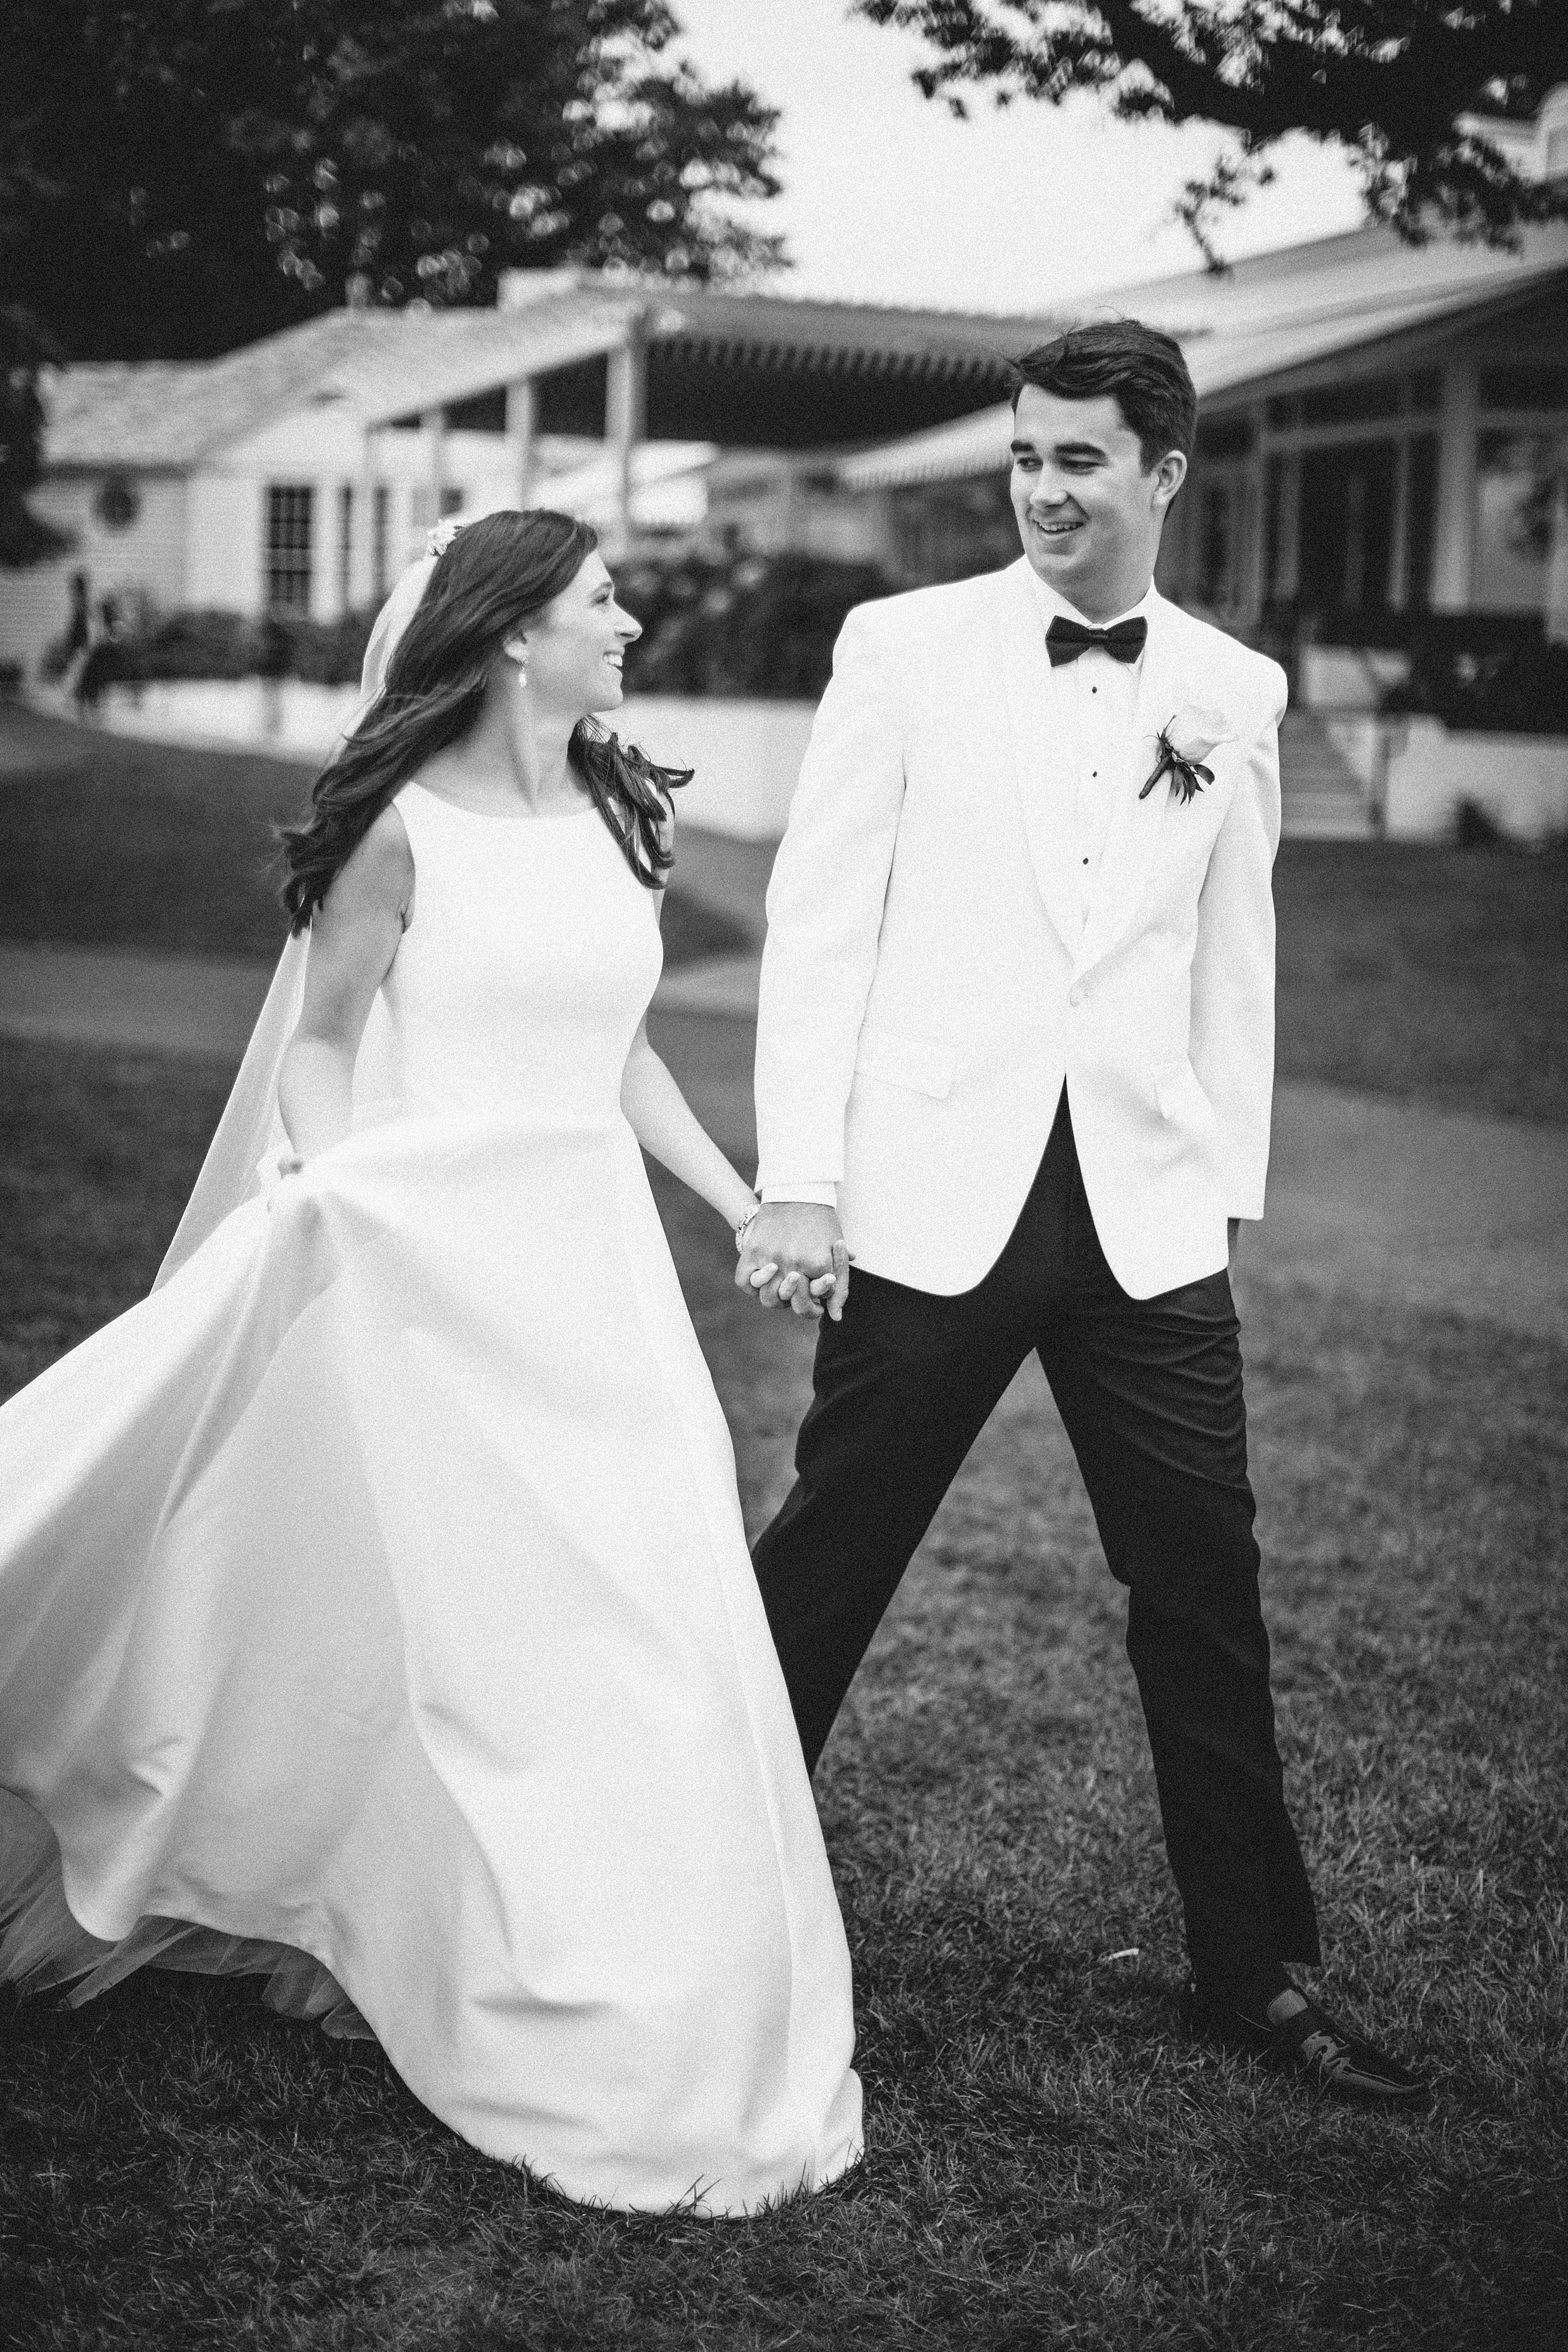 rumson-tented-wedding-nj-maine-conneticut-classic_0035.jpg